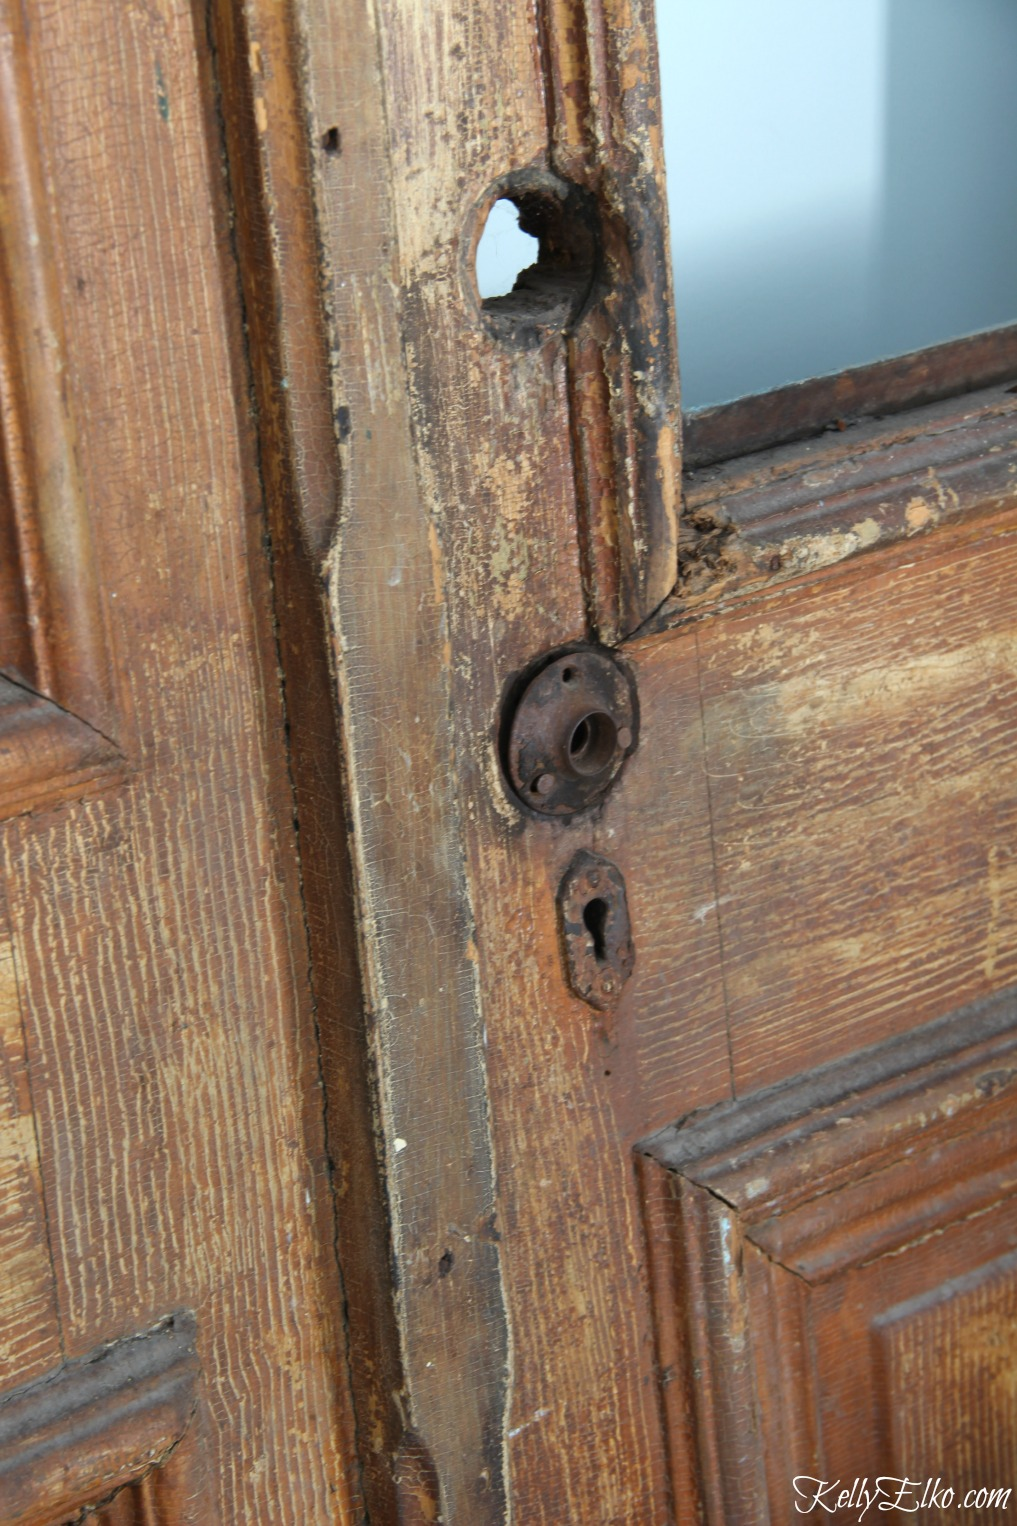 Time worn character on antique wood doors kellyelko.com